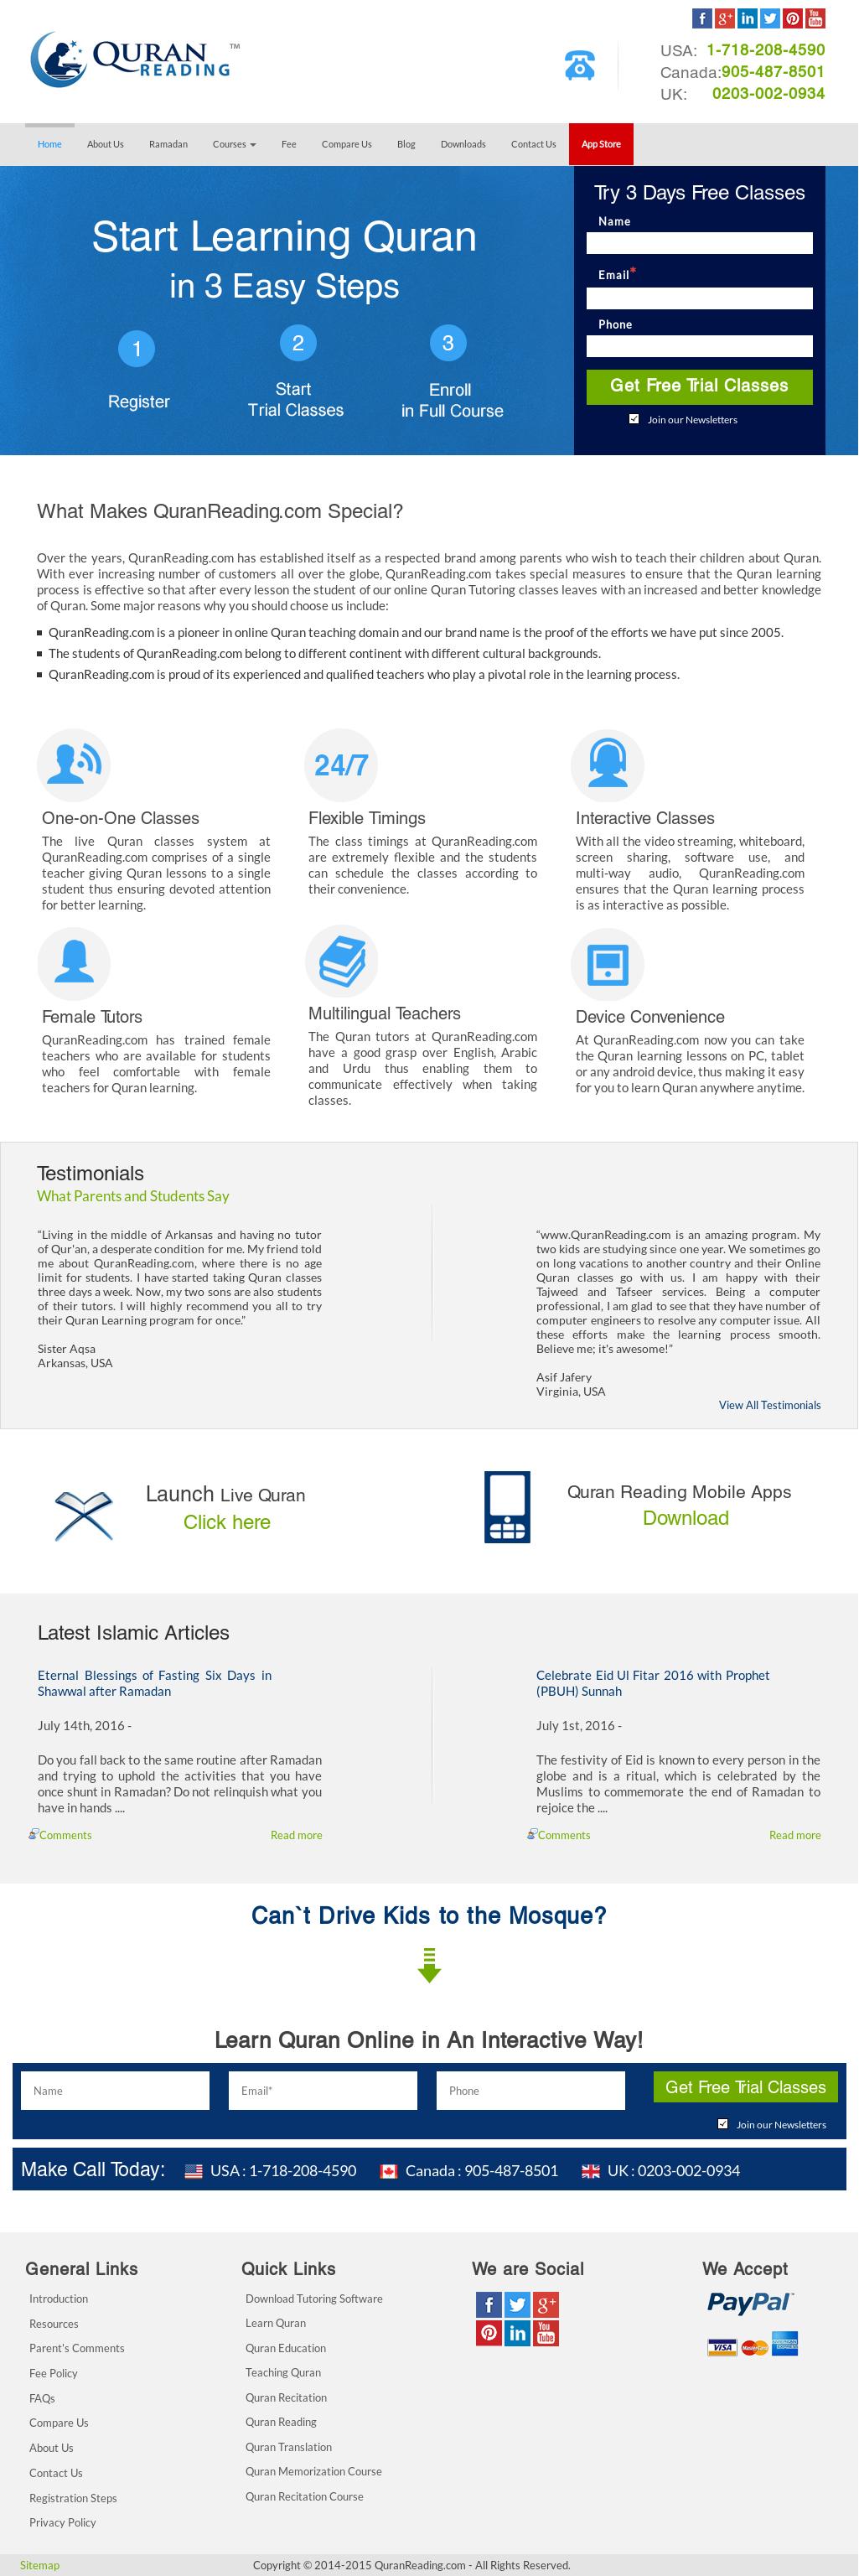 Quranreading Competitors, Revenue and Employees - Owler Company Profile